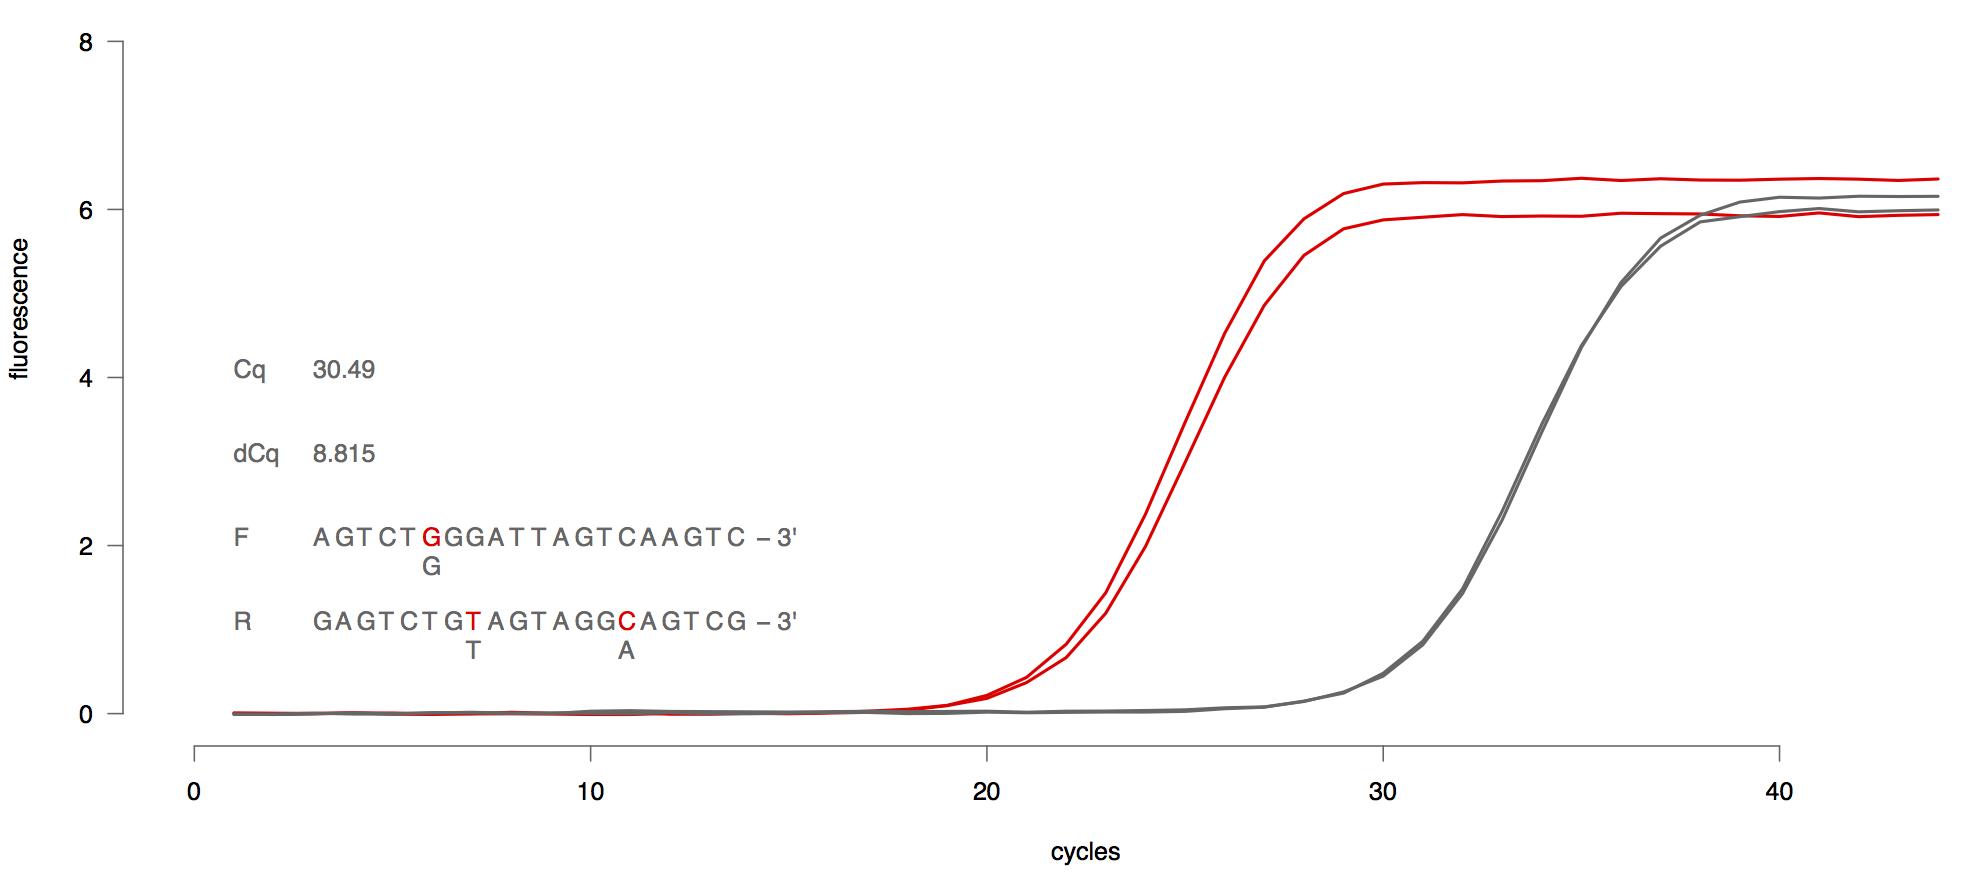 The gene expression blog